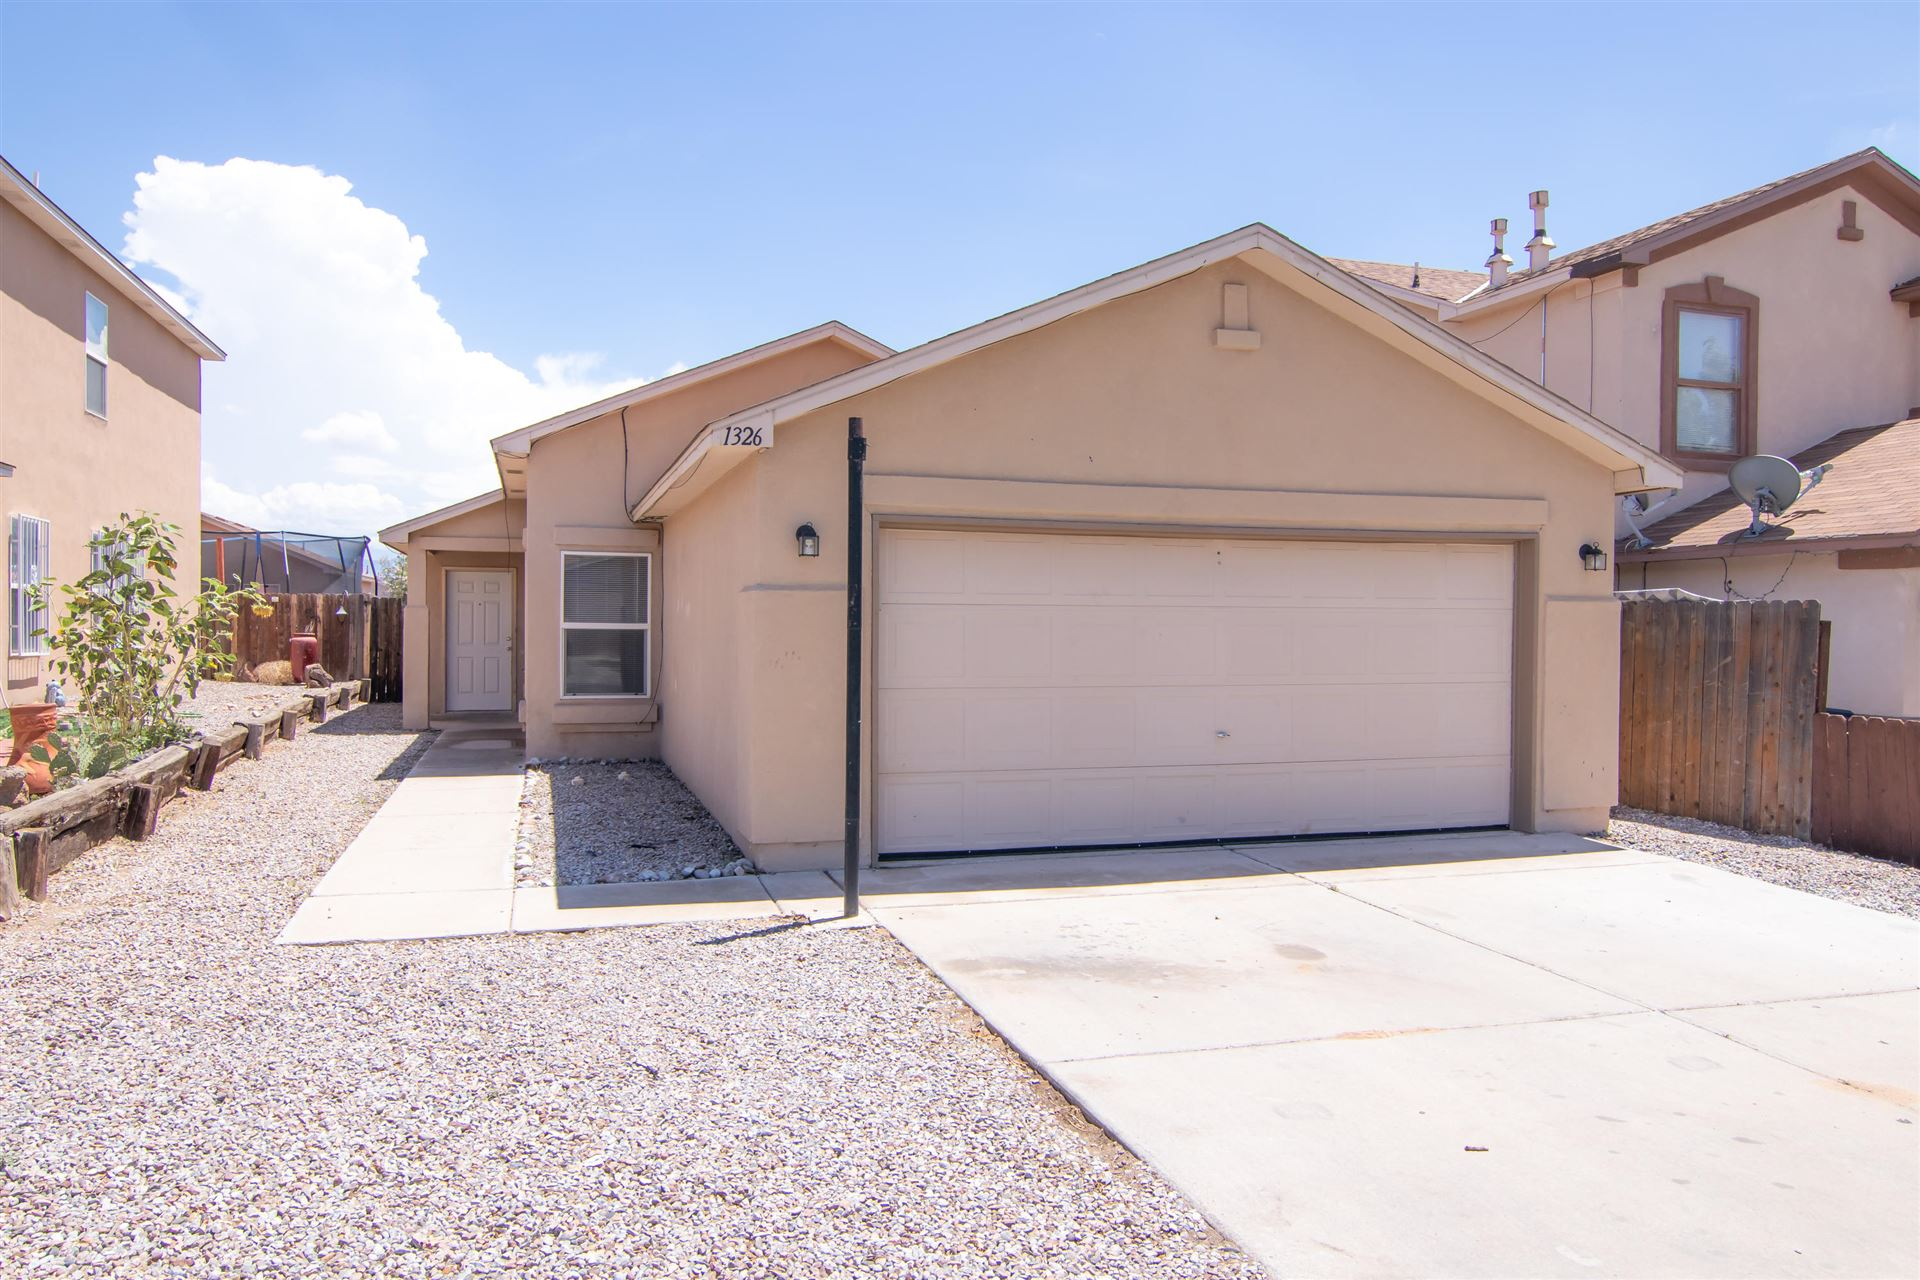 1326 Arroyo Hondo Street SW, Albuquerque, NM 87121 - #: 973246